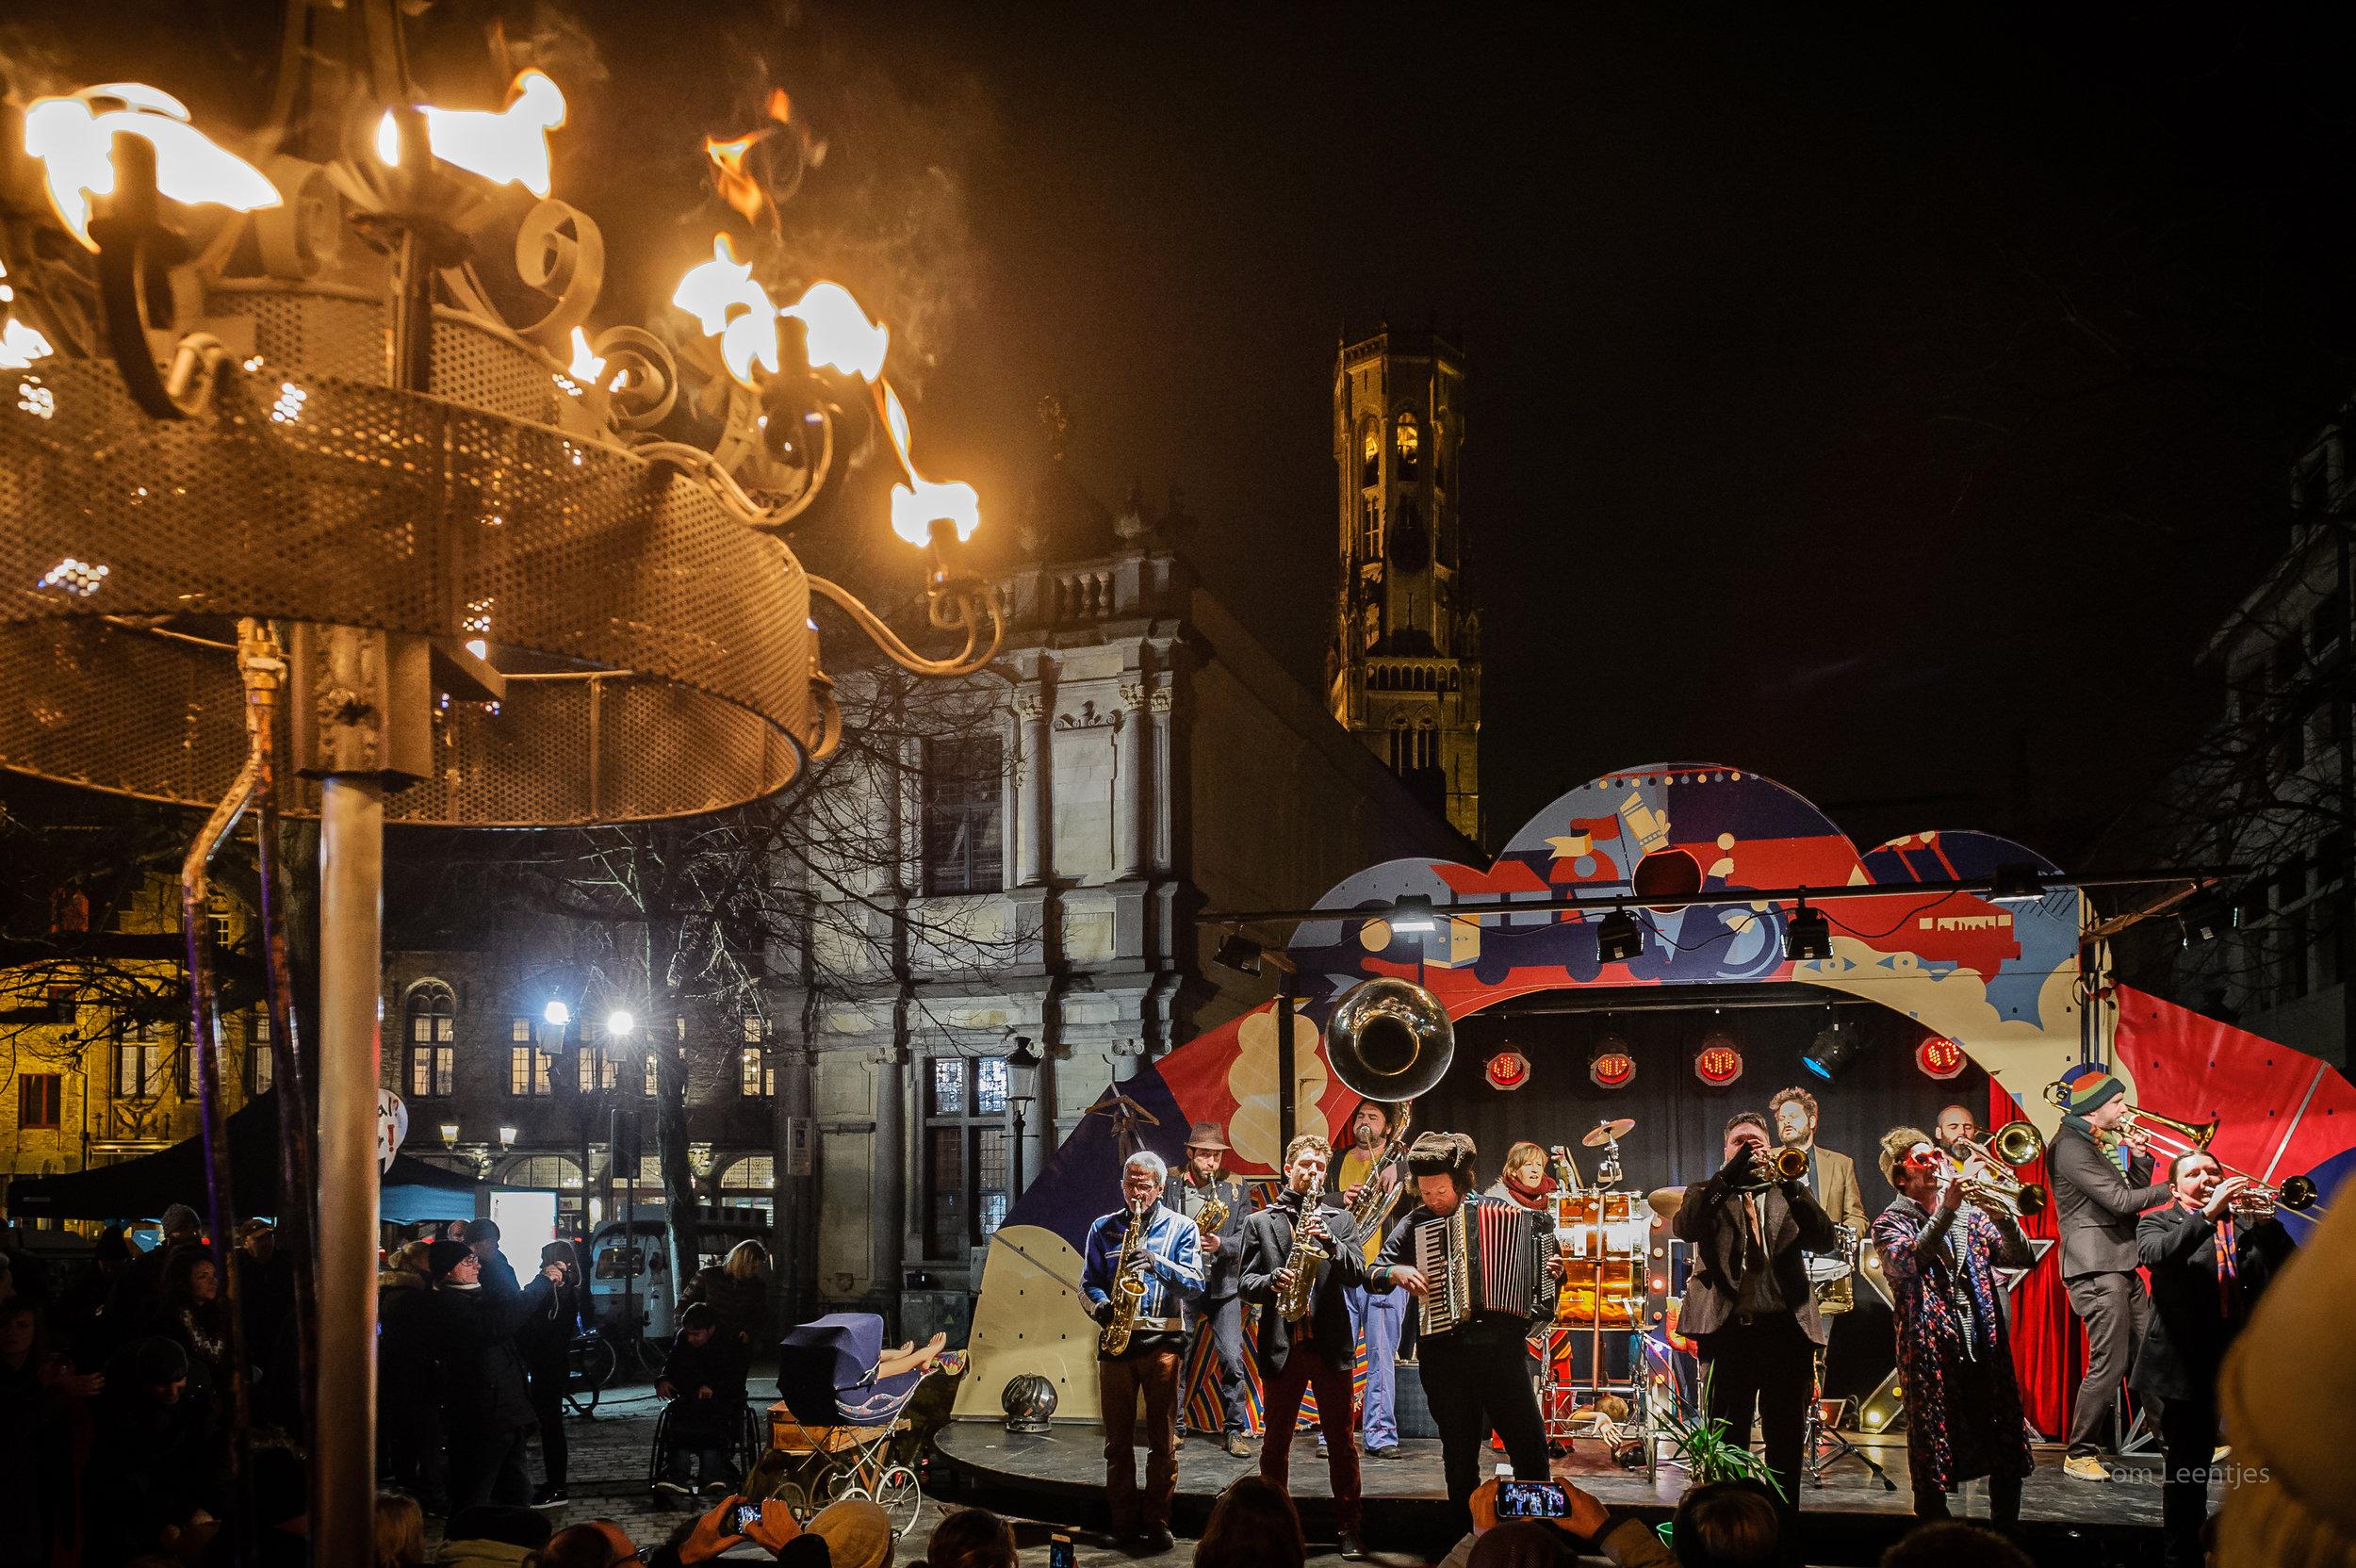 20180126_Wintervonken_Burg_Brugge_Tom_Leentjes-13.jpg